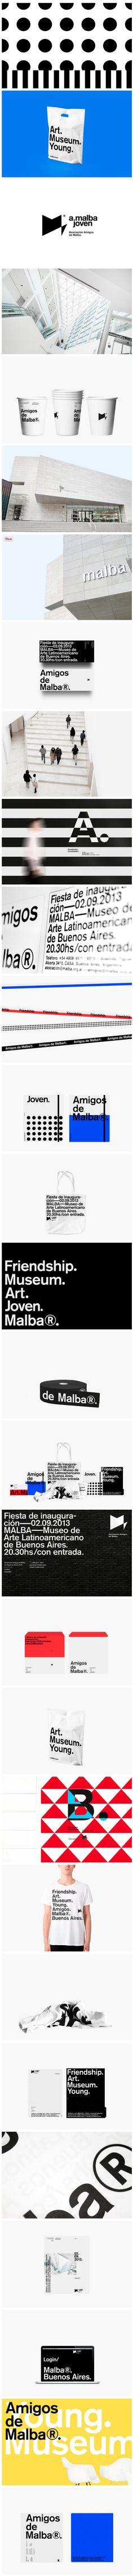 53 new ideas design studio identity shape Corporate Design, Brand Identity Design, Graphic Design Typography, Graphic Design Illustration, Branding Design, Corporate Identity, Museum Identity, Museum Branding, Web Design